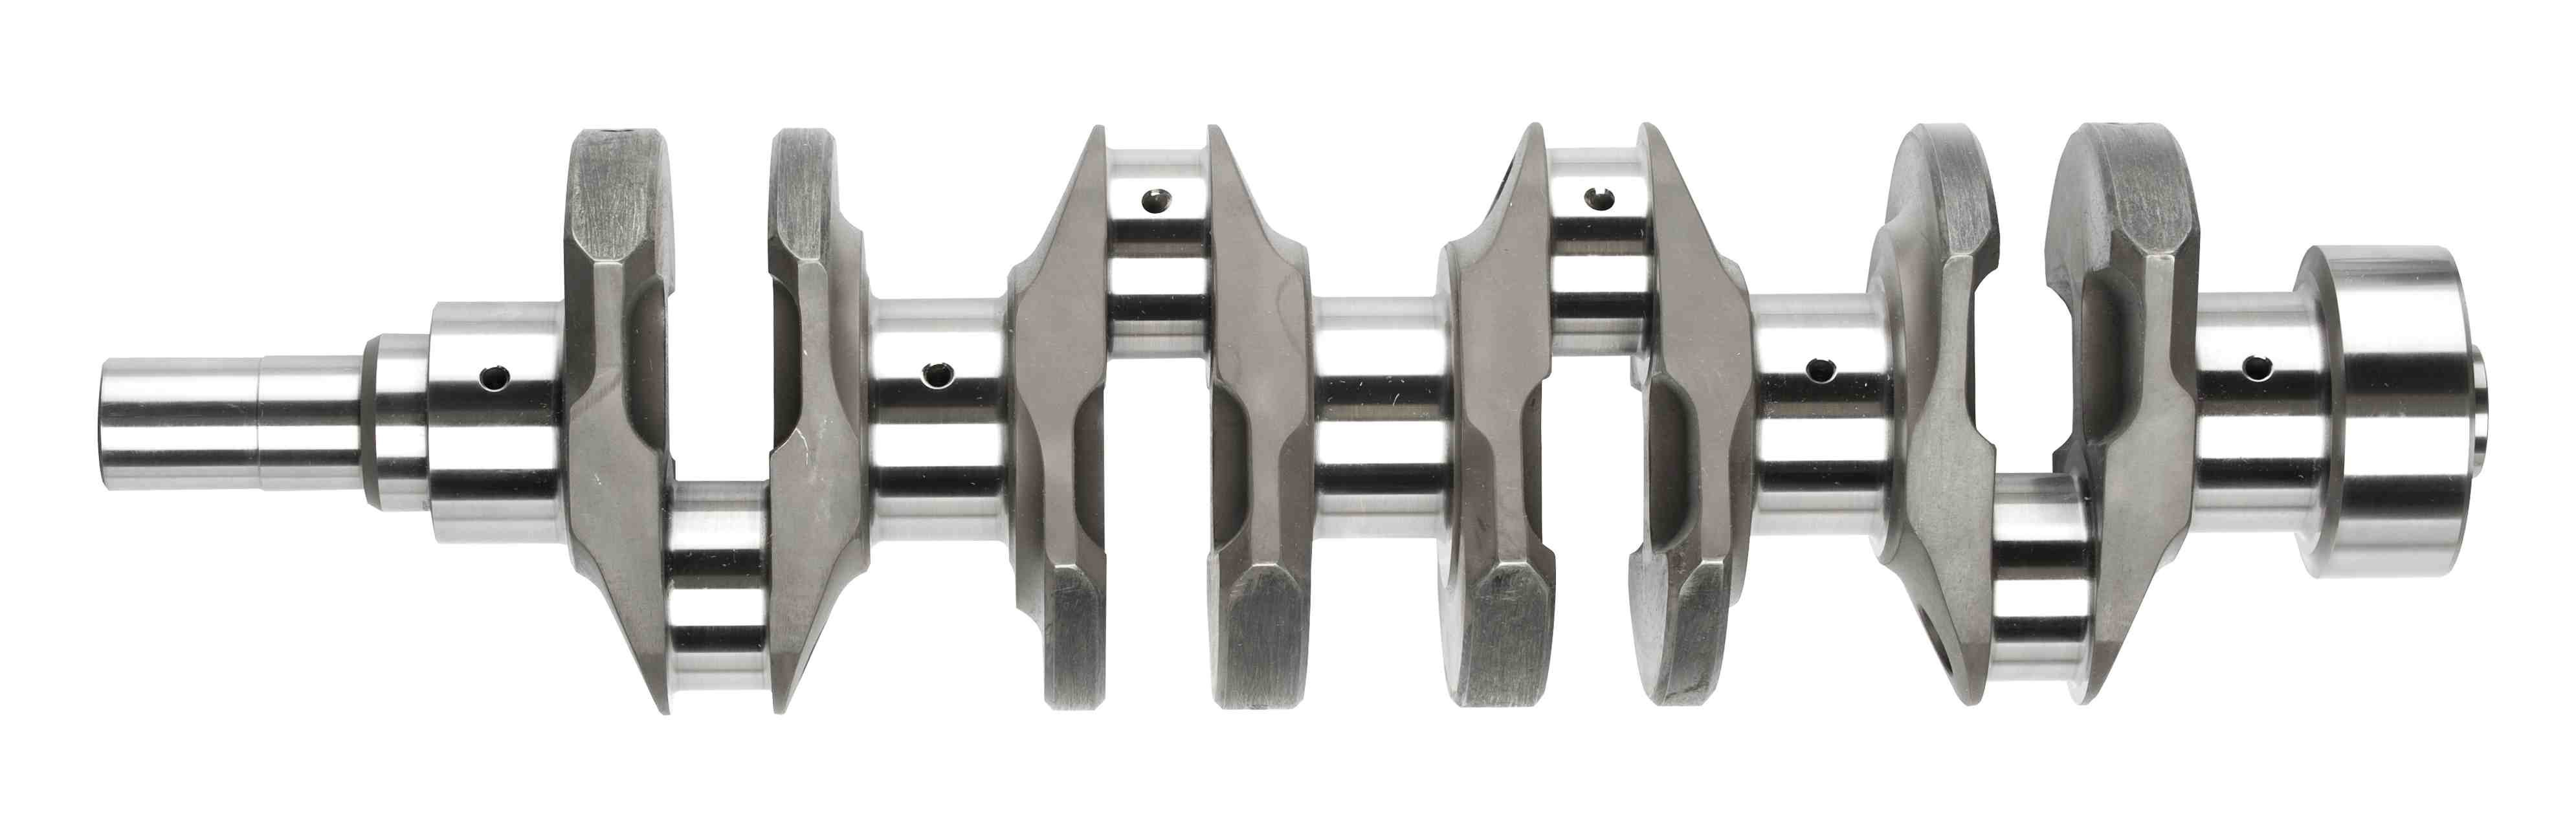 Cosworth YB Crankshafts / 84.00mm